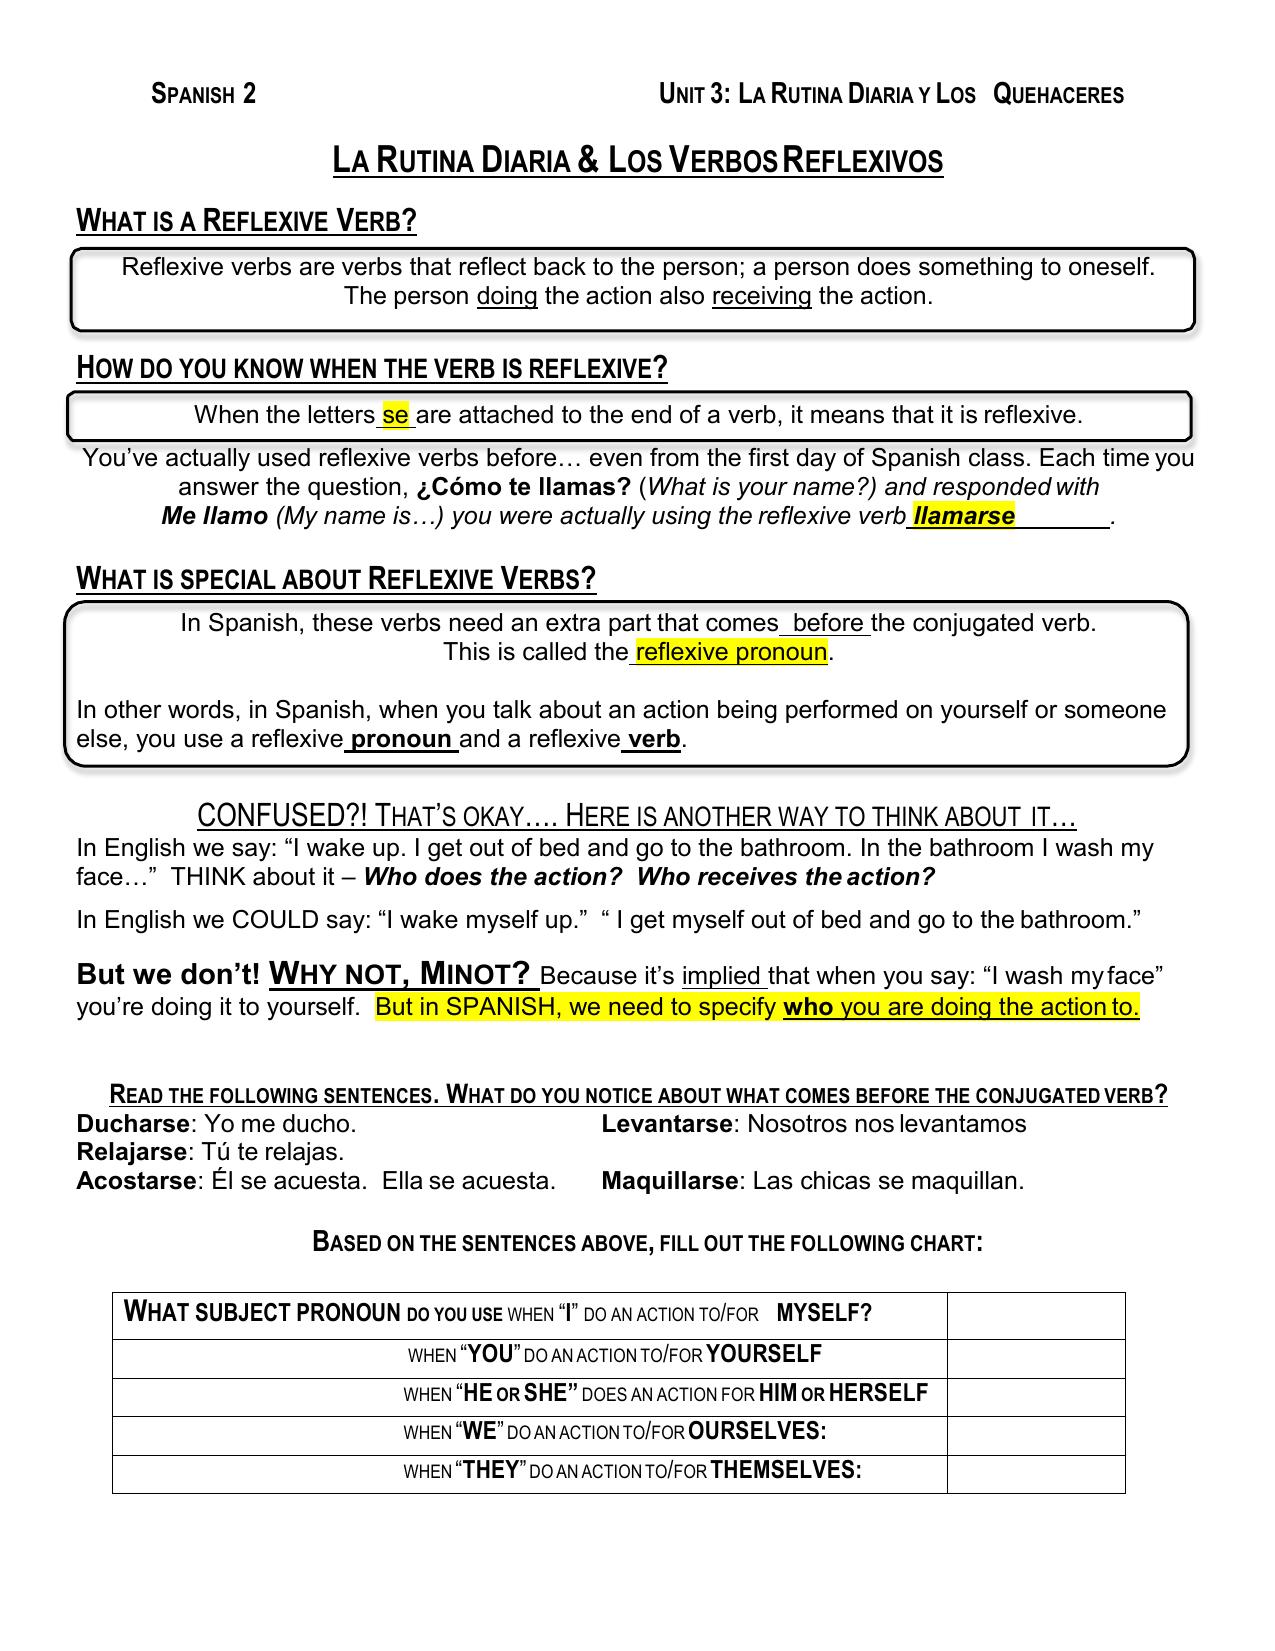 Spanish 2 Reflexive Verb Conjugation – Reflexive Verbs Worksheet